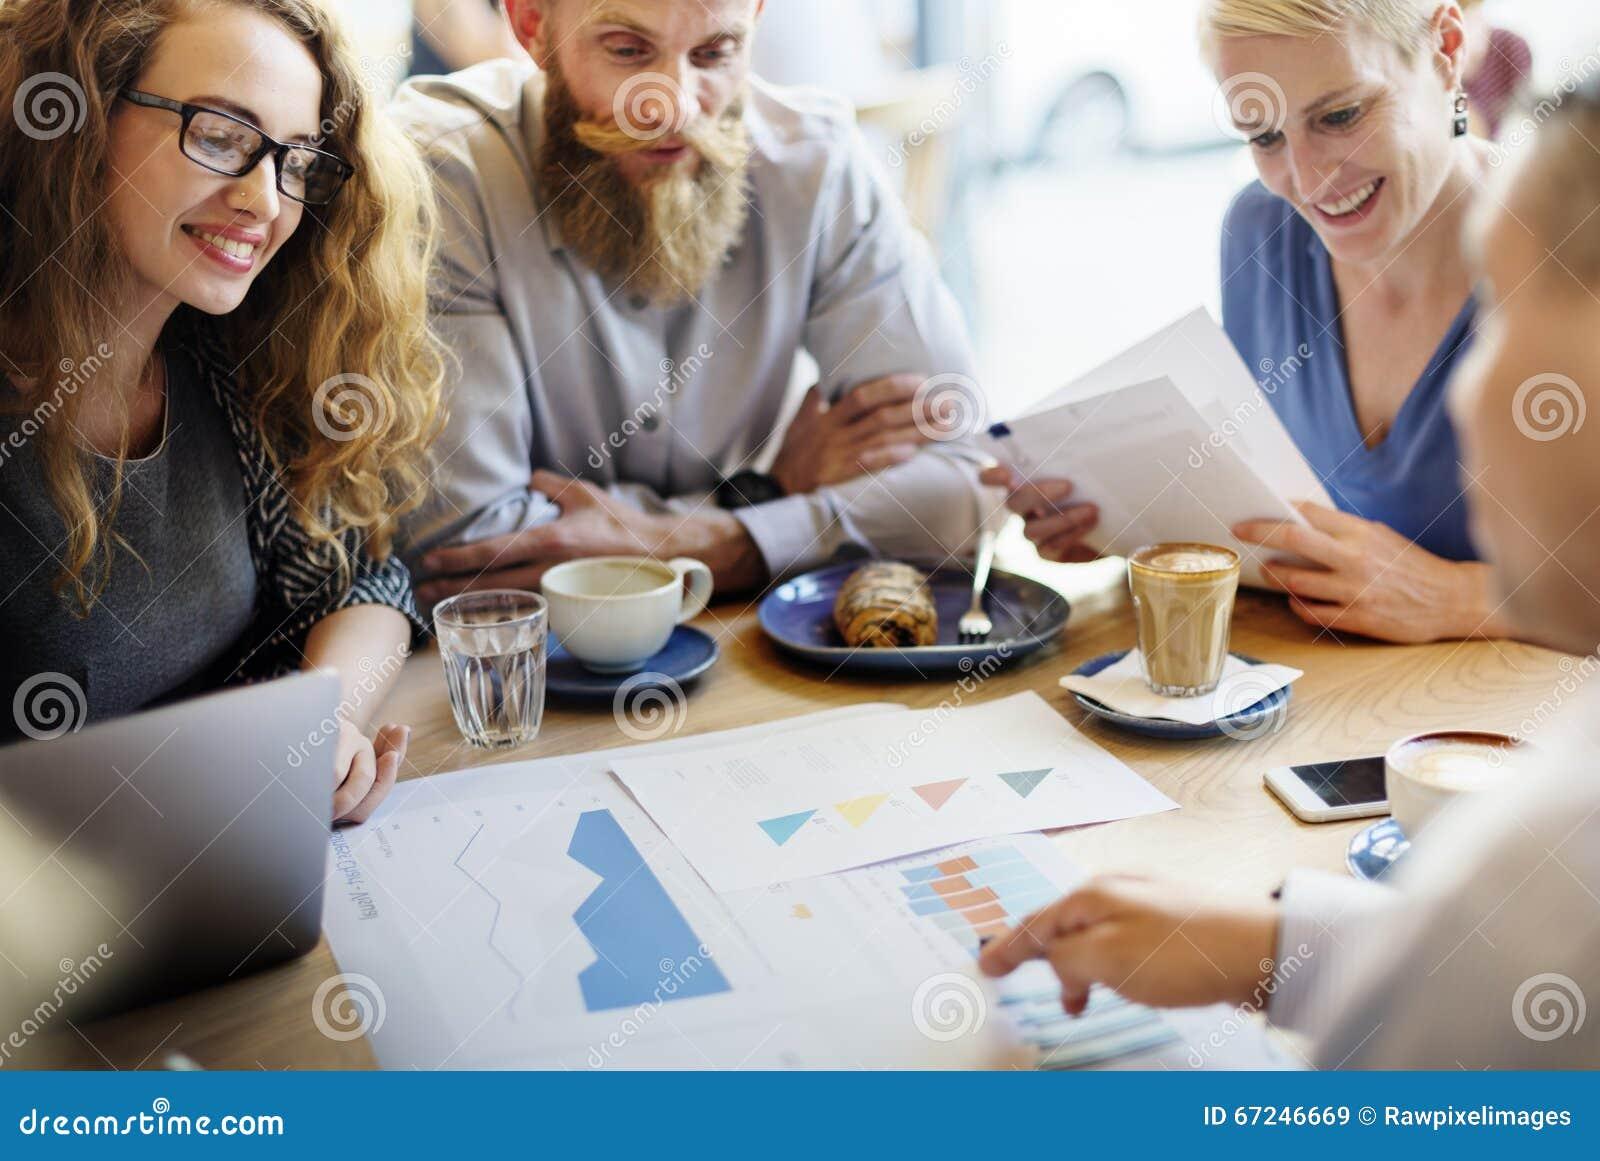 Concept de Team Meeting Strategy Marketing Cafe d affaires